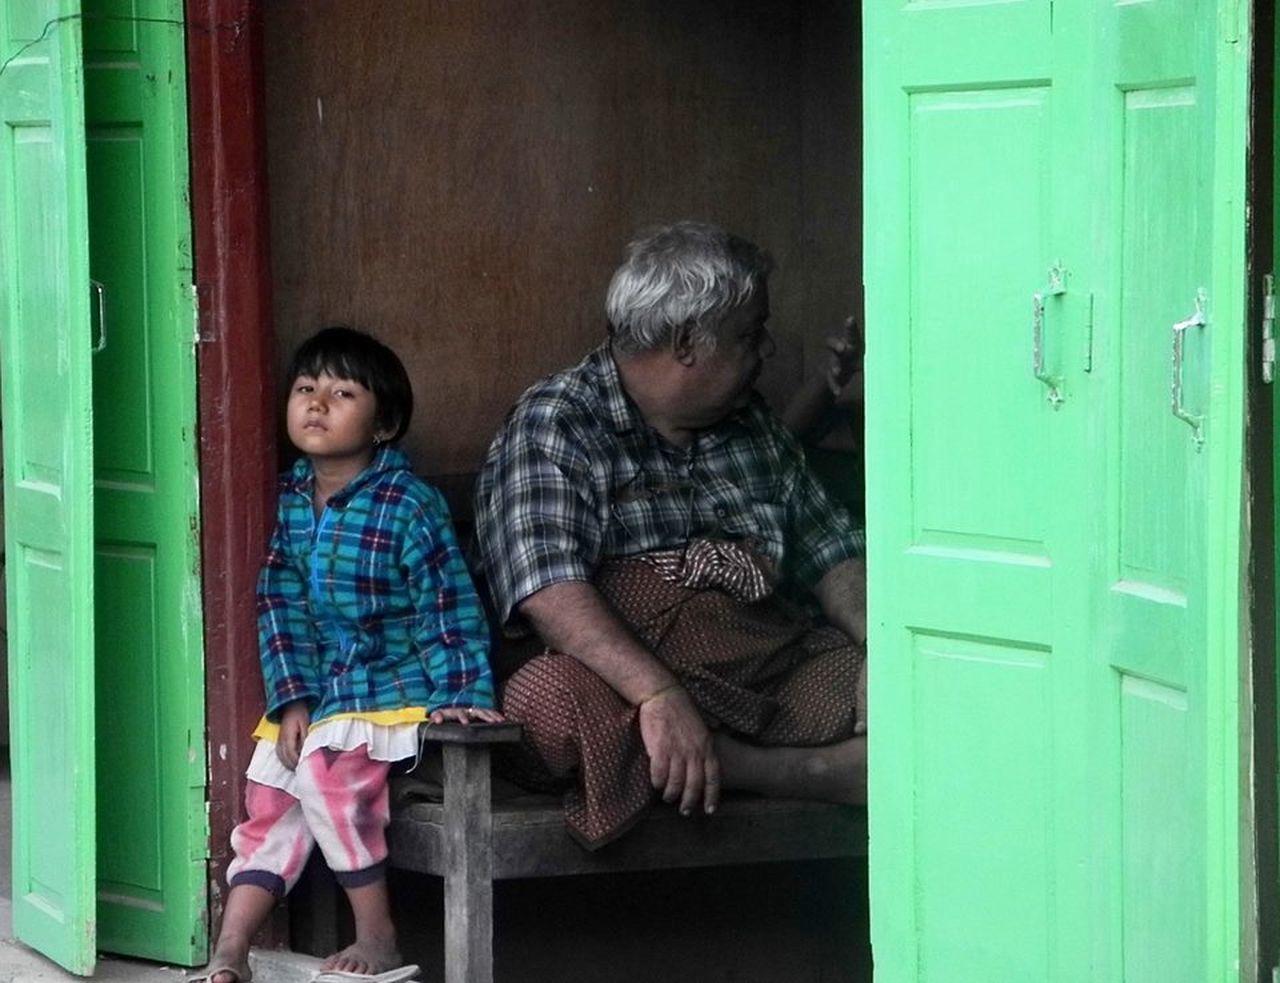 Child And Adult Childhood Door Green Doors Happiness Simplicity Staring Wood